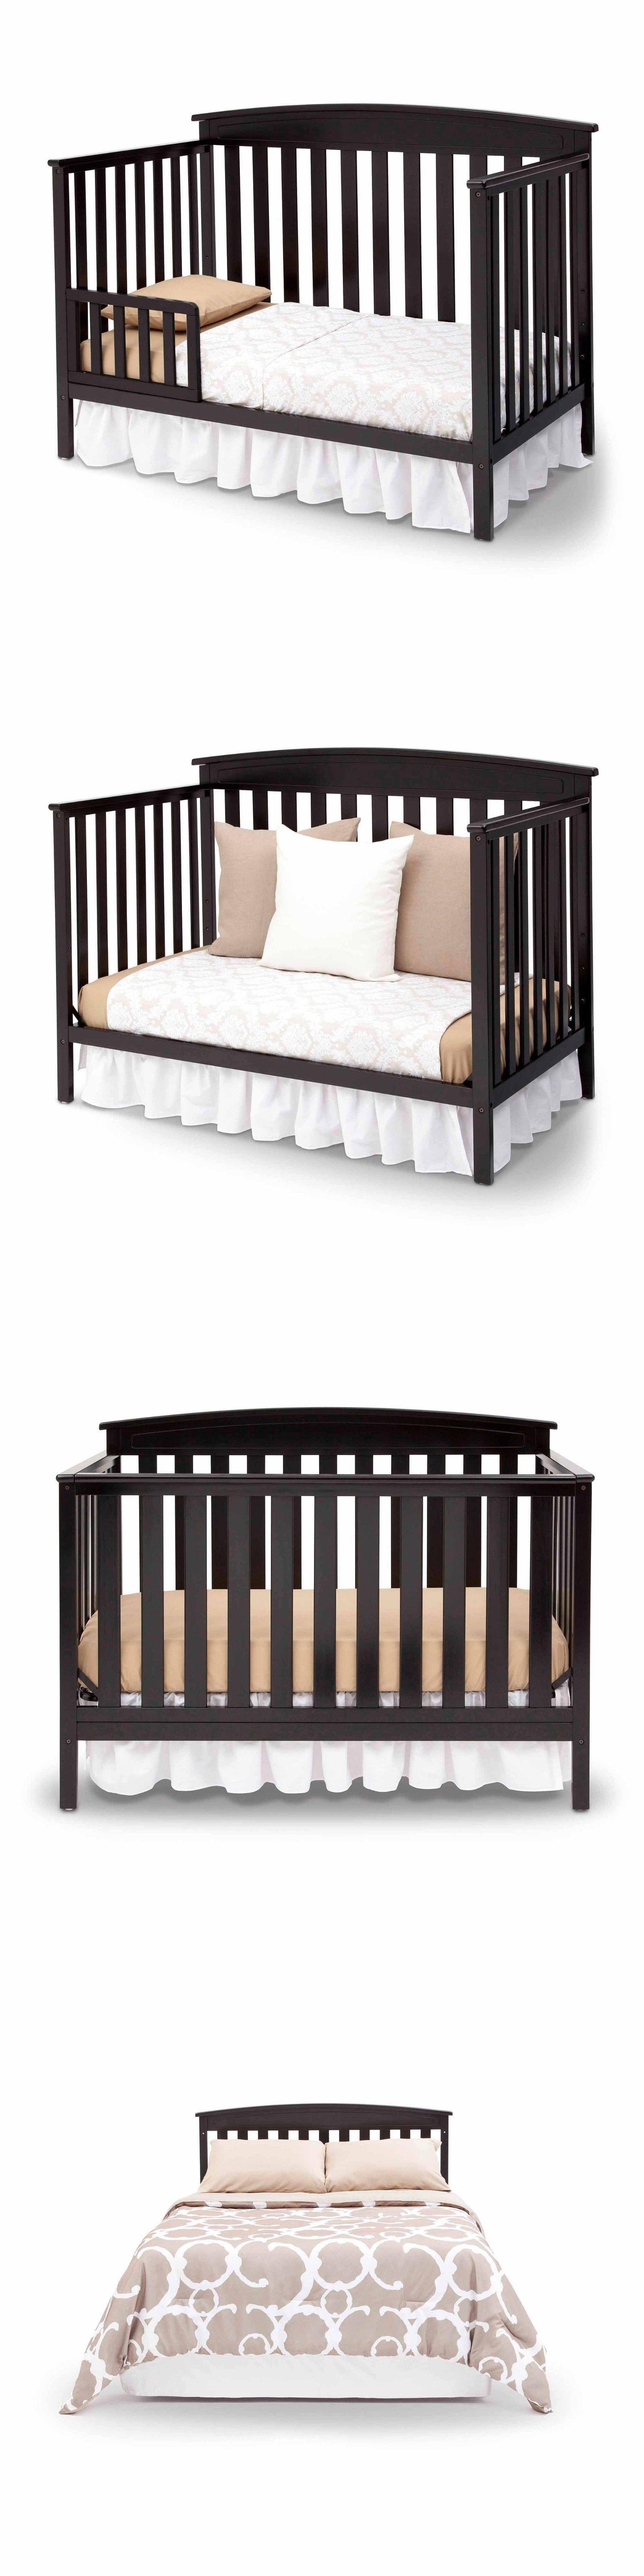 Nursery Furniture 20422 Delta Children Gateway 4 In 1 Convertible Crib Black Buy It Now Only 149 99 On Nursery Furniture Convertible Crib Delta Children